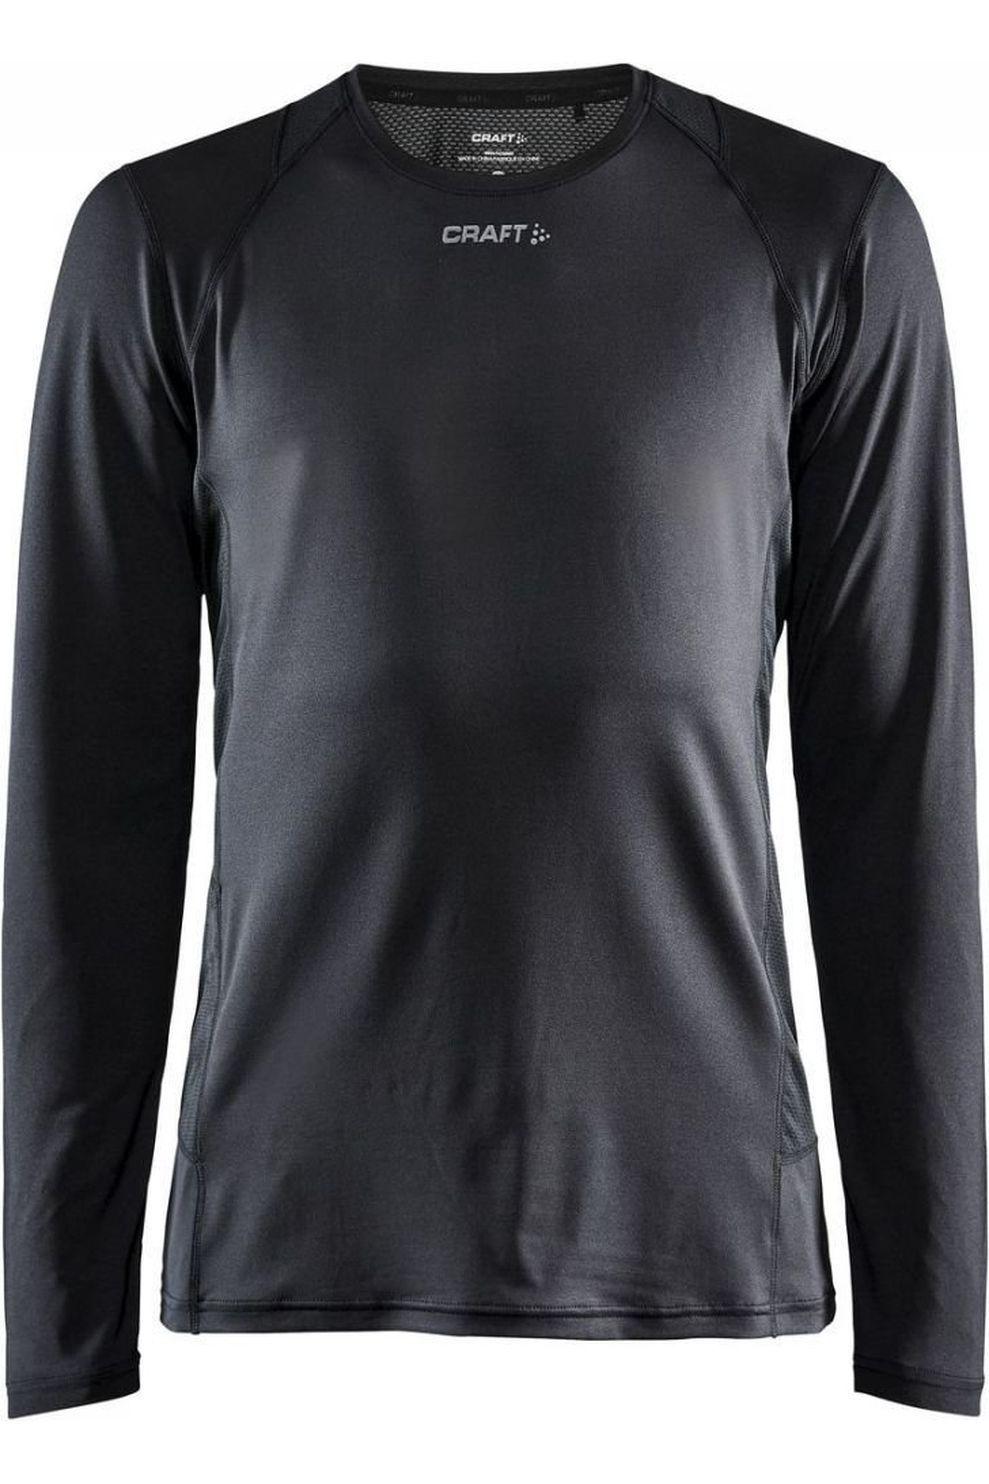 Craft T-Shirt Adv Essence voor heren - Zwart - Maten: XS, S